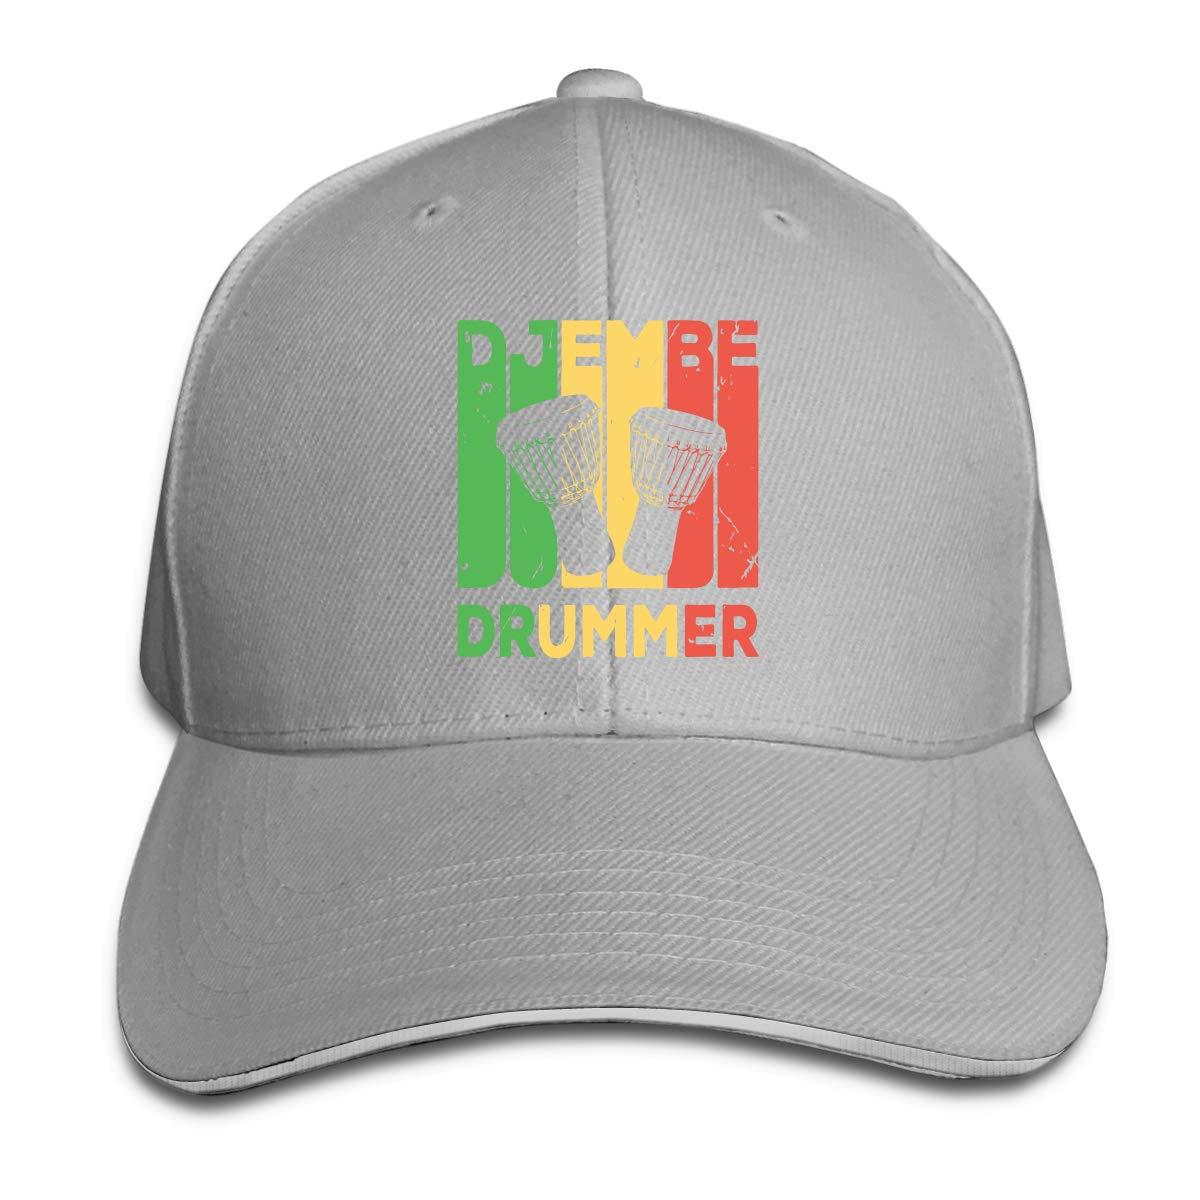 Djembe Drummer Vintage Outdoor Snapback Sandwich Cap Adjustable Baseball Hat Plain Cap